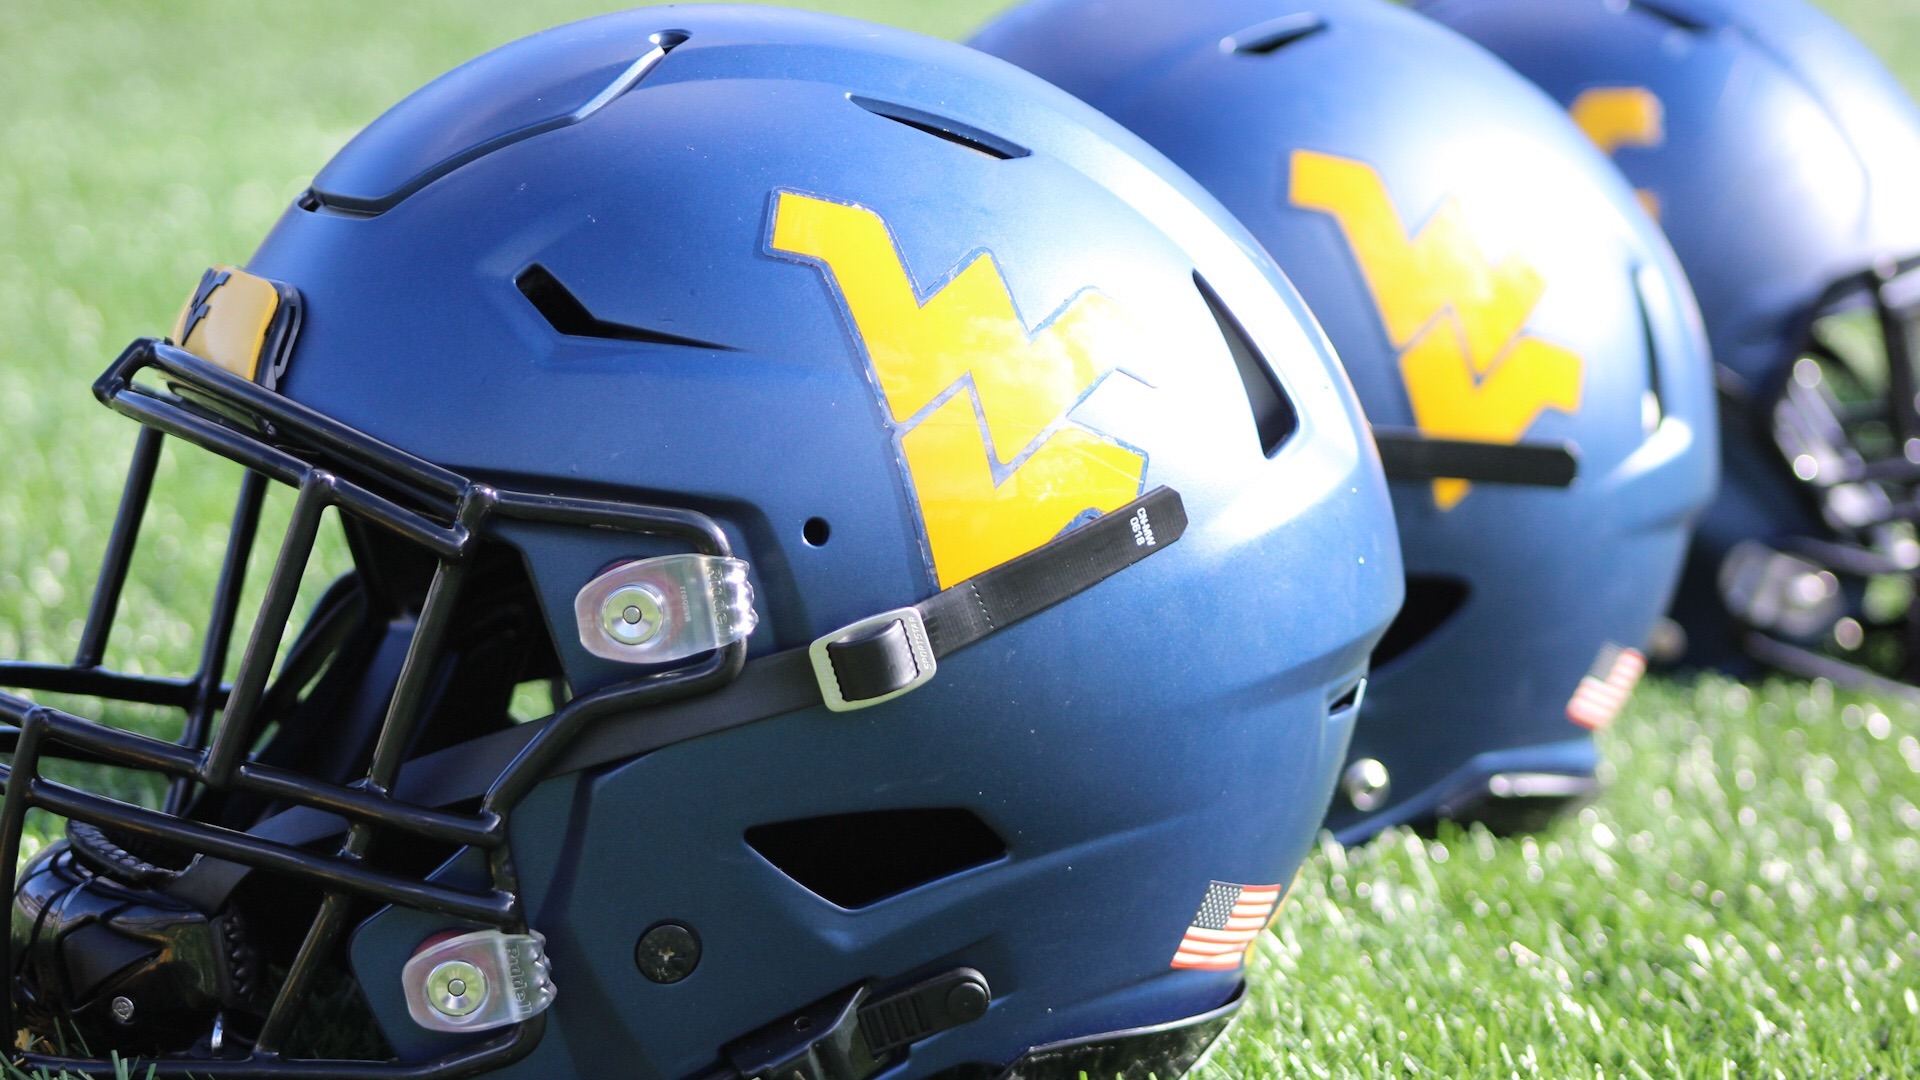 Wvu Football To Feature Blm Sticker On Helmets Wtrf